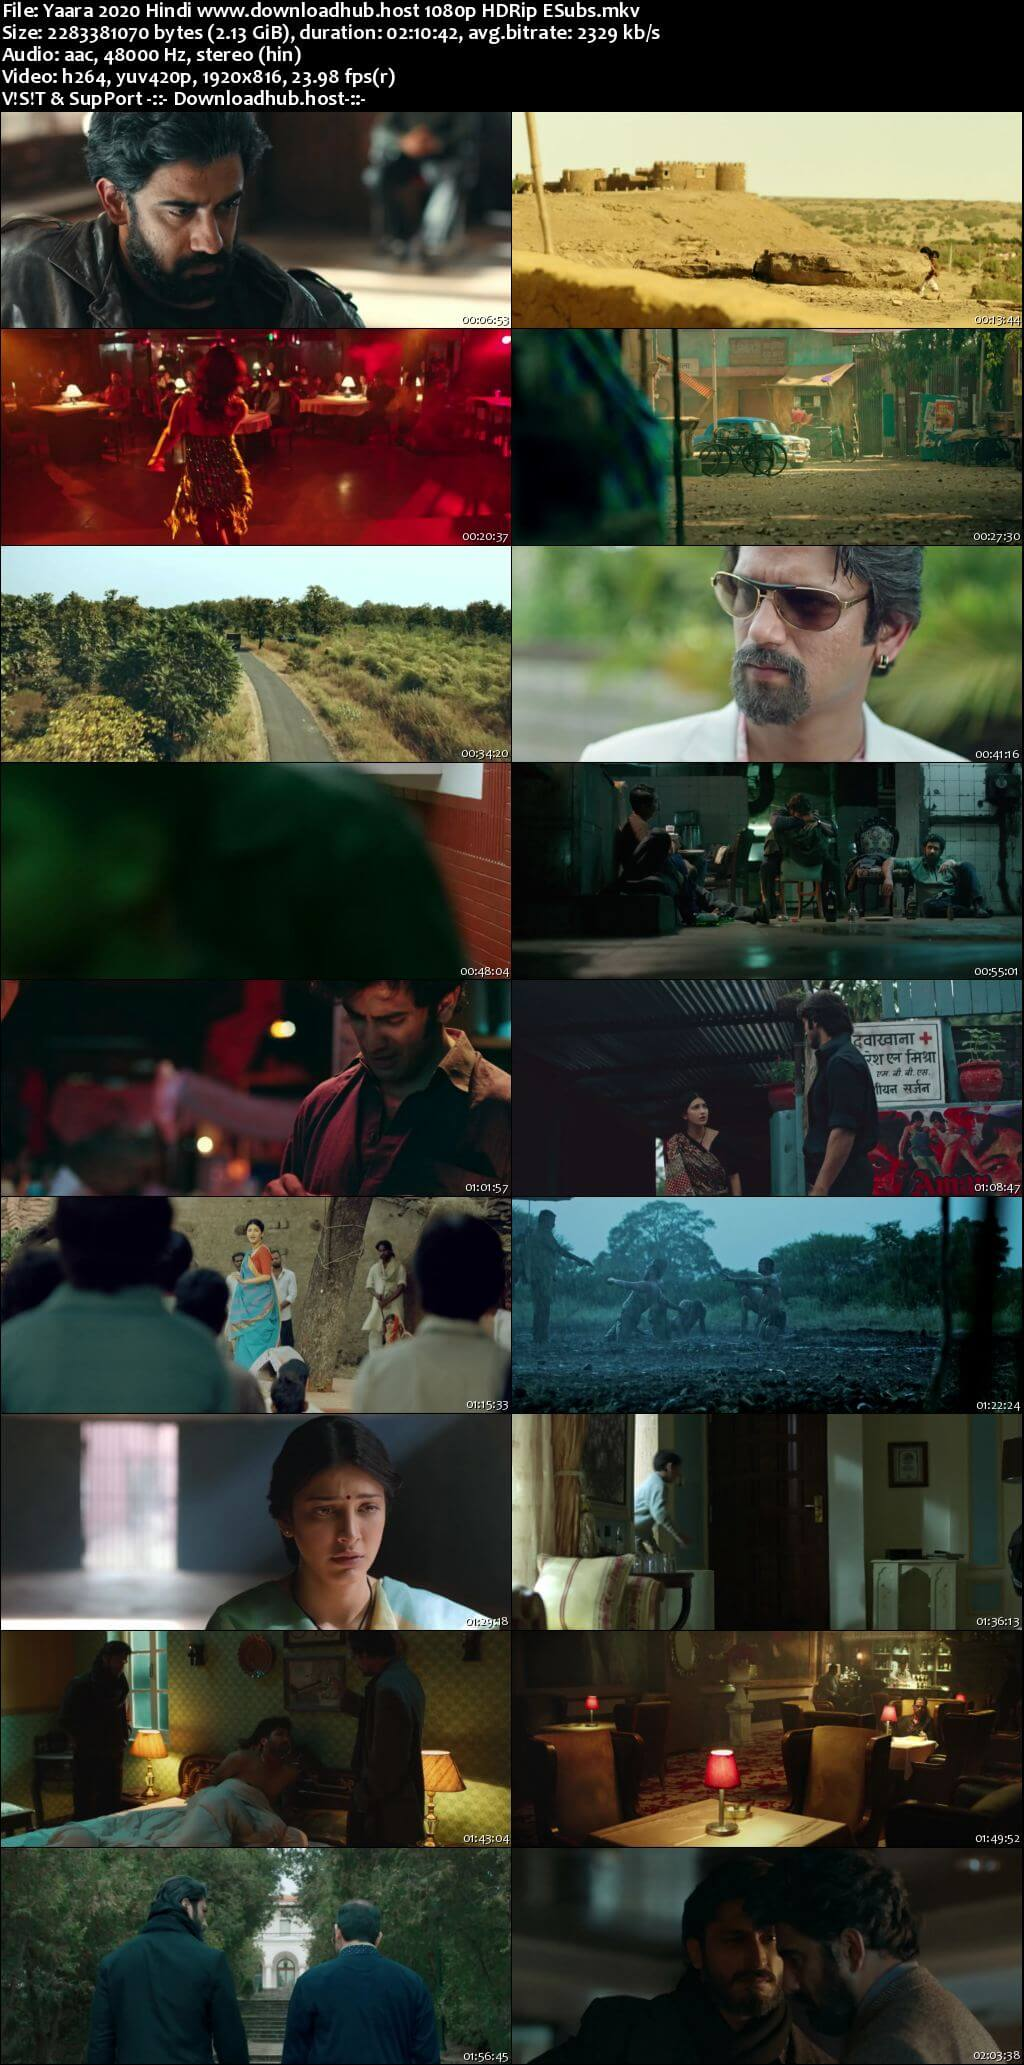 Yaara 2020 Hindi 1080p HDRip ESubs